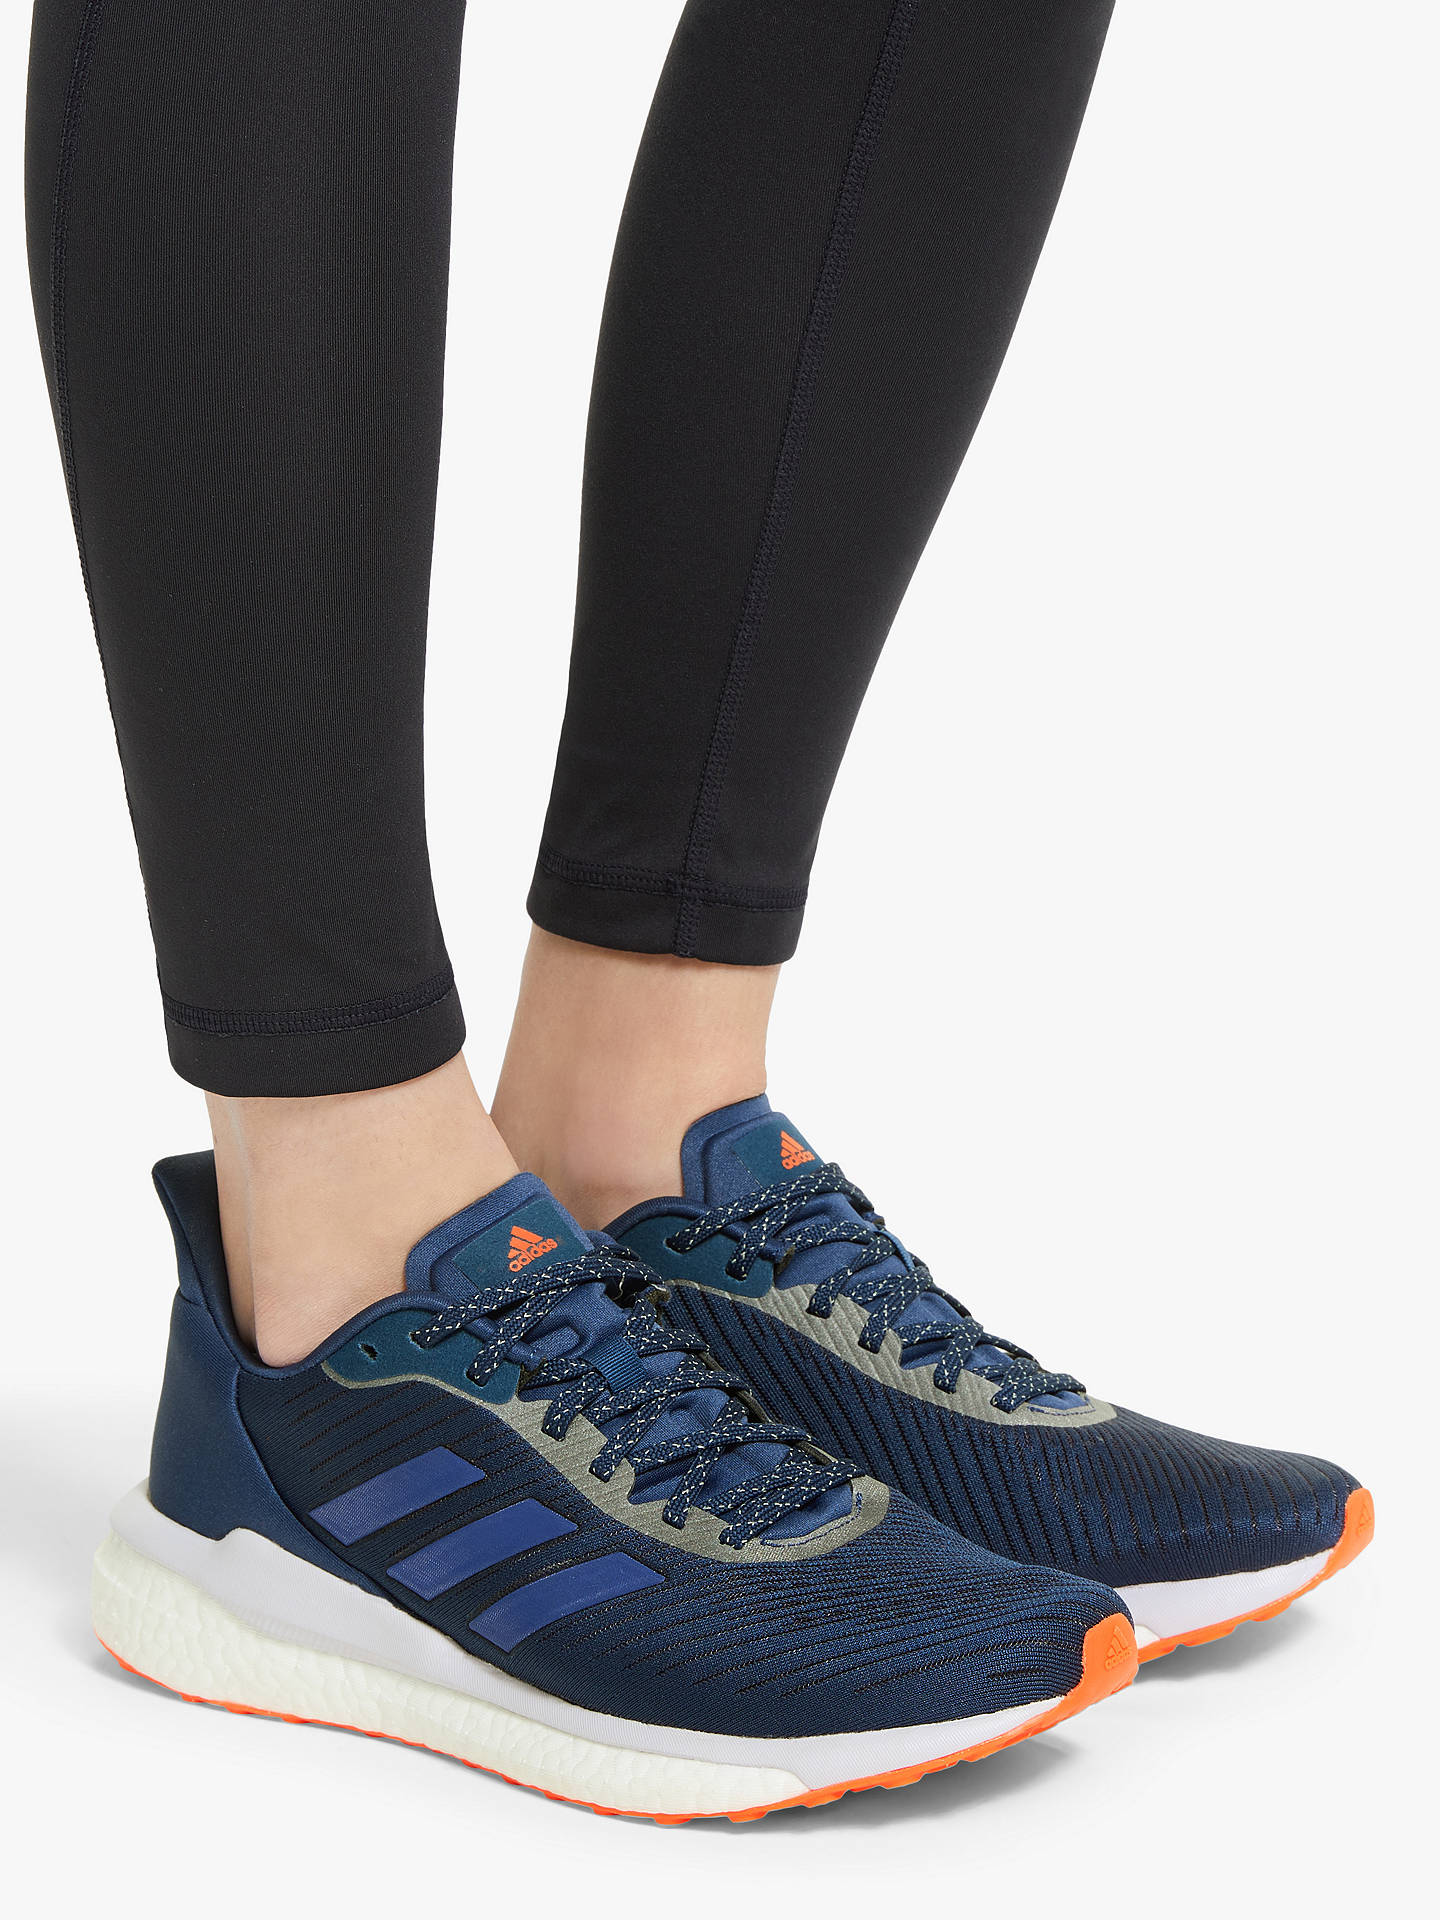 aniversario cráneo Especificado  adidas Solar Drive 19 Women's Running Shoes, Tech Indigo/Boost Blue Violet  Met./Purple Tint at John Lewis & Partners